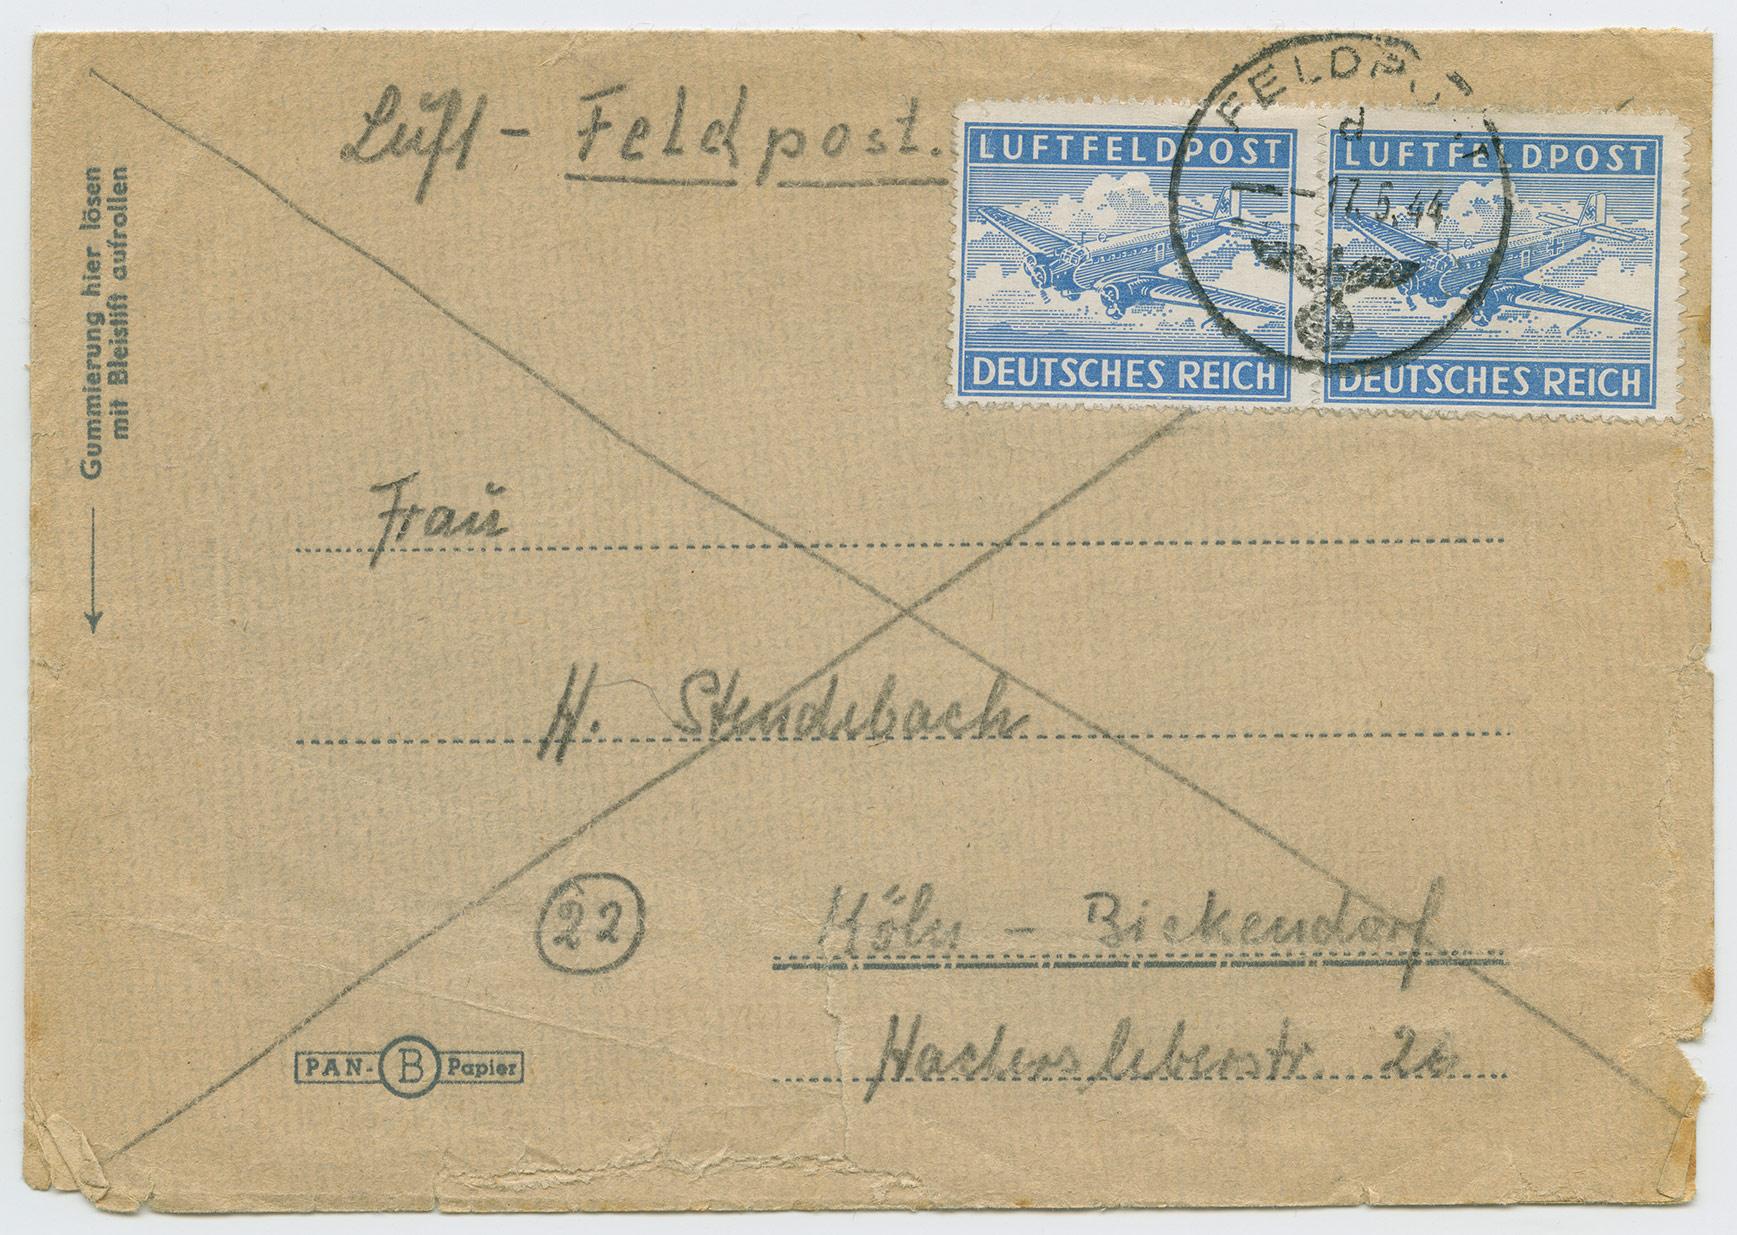 1115a-Luftfeldpost-38566C-Narva-font-Köln-Bickendorf-1944-postiajalugu-ee